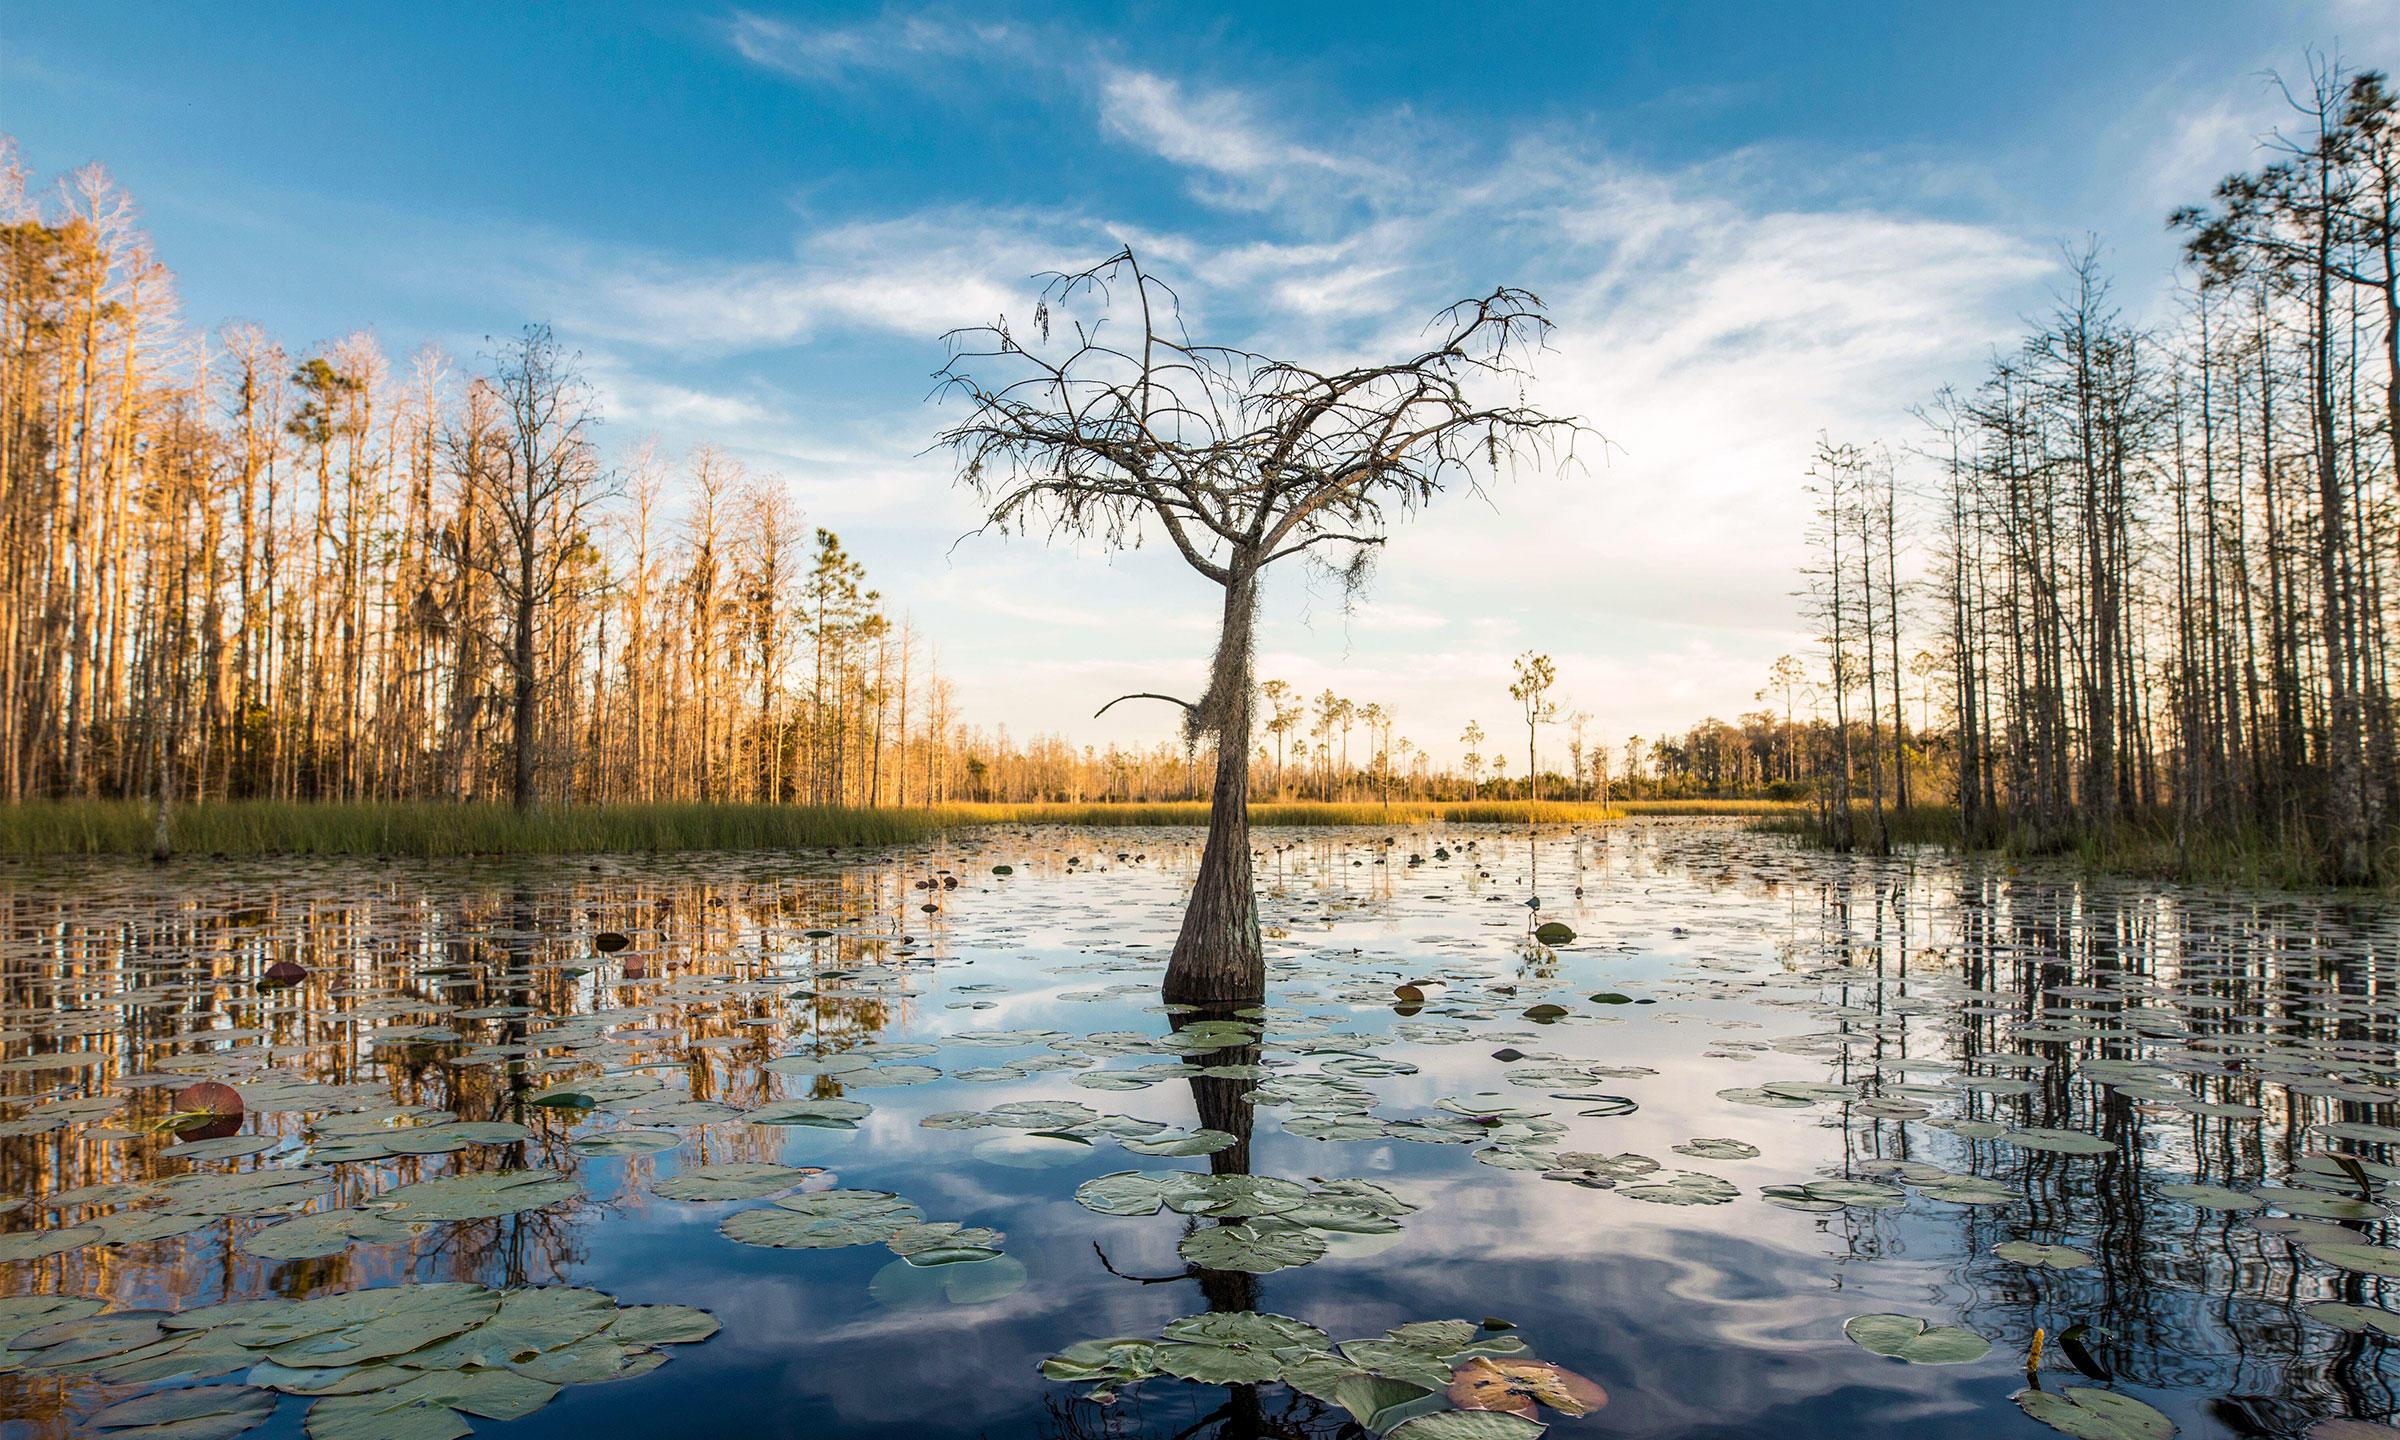 Okefenokee National Wildlife Refuge. John Wollwerth/Alamy